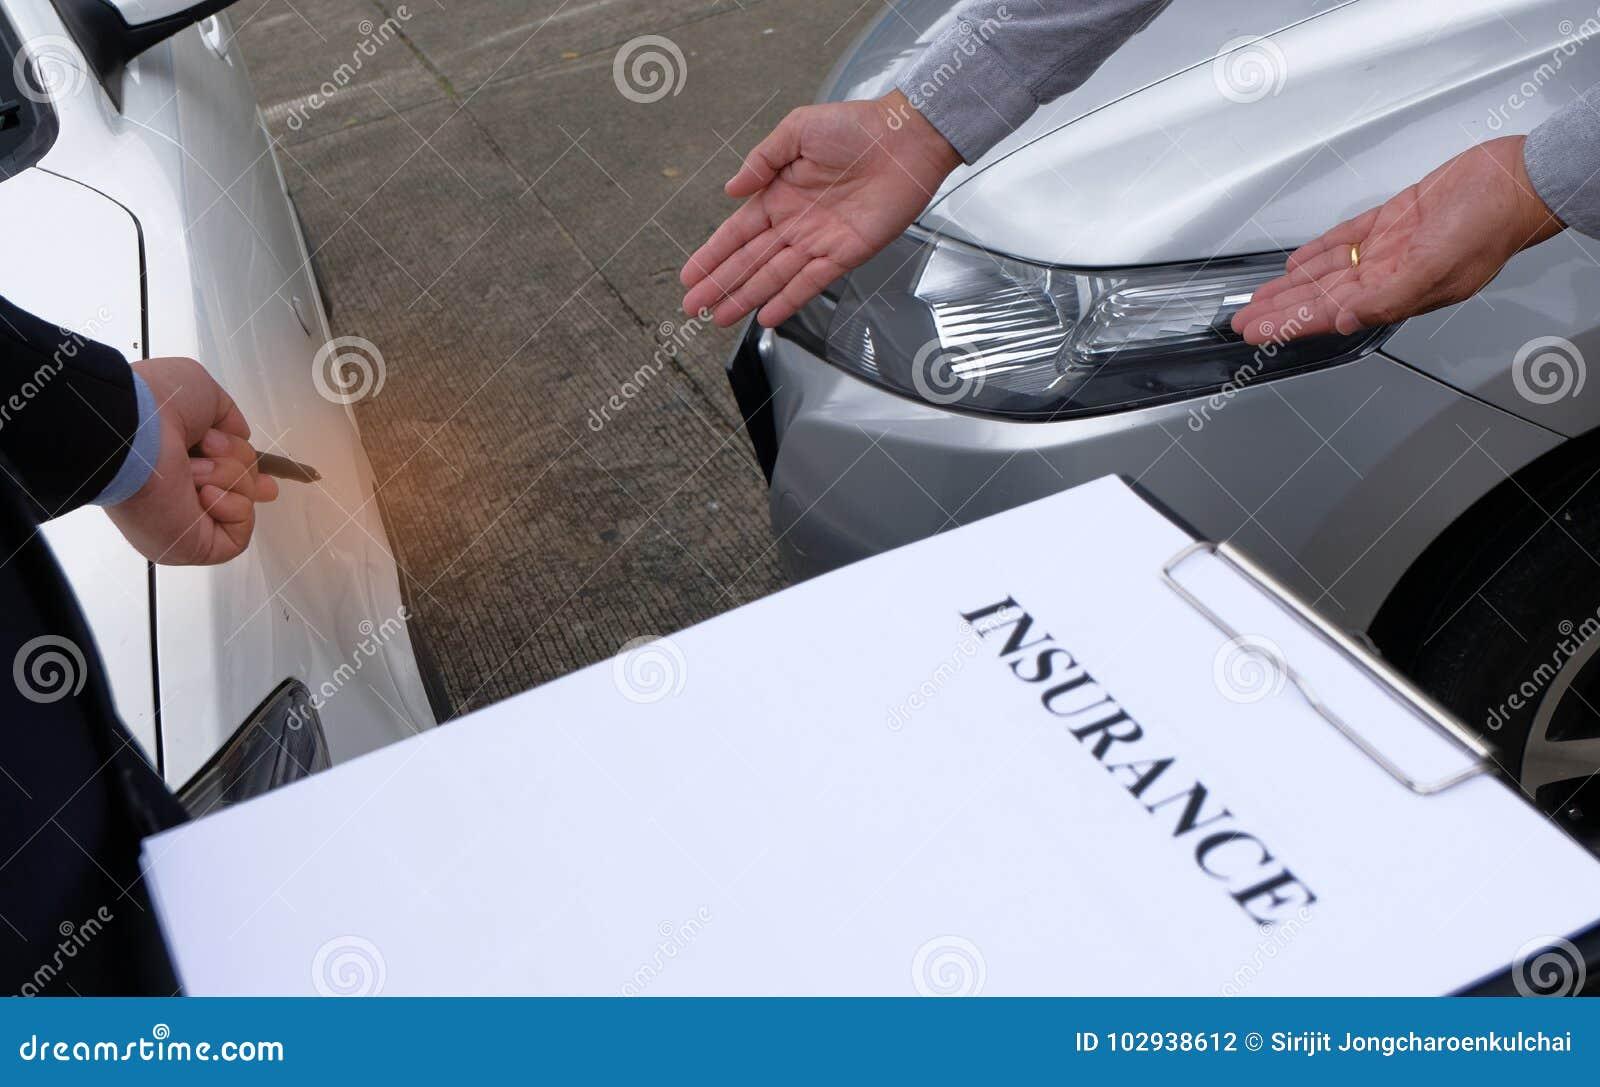 Loss Adjuster Insurance Agent Inspecting Damaged Car ...